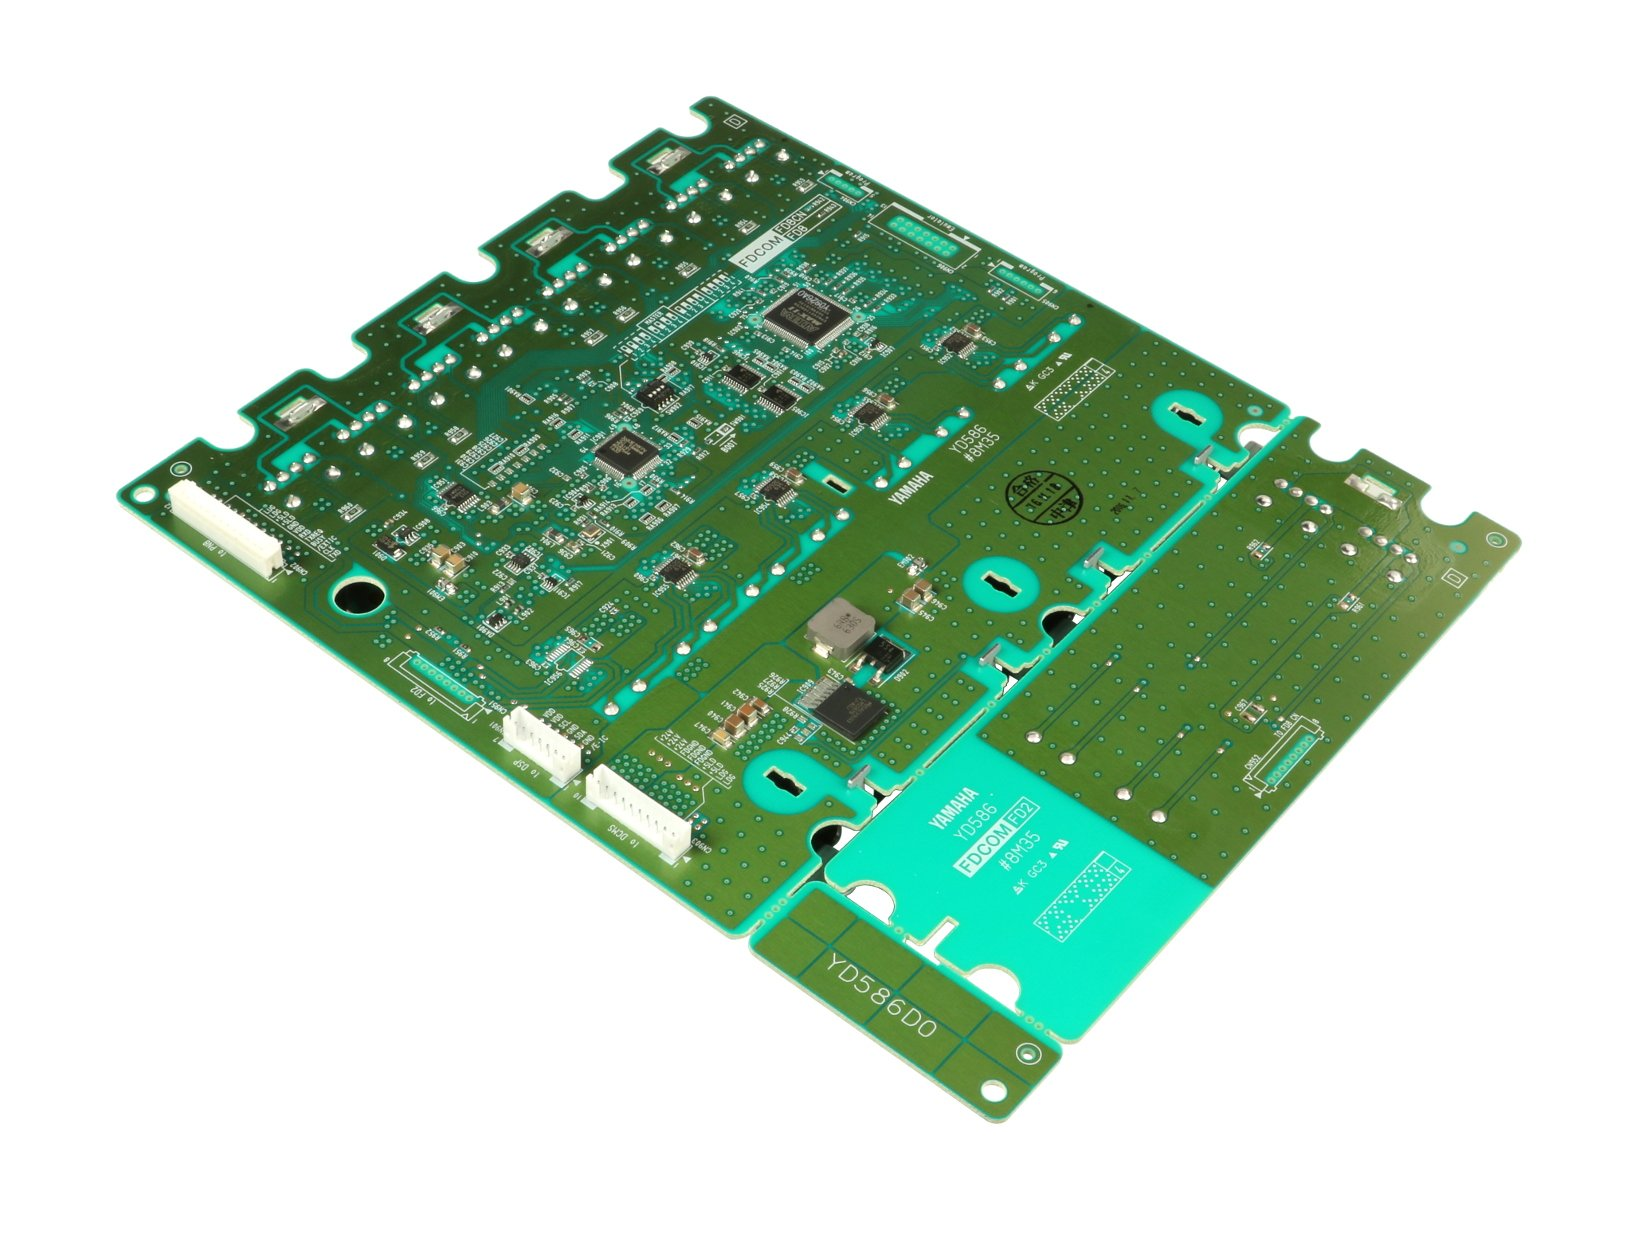 Fader Bank Left 1-8, 9-16 Center PCB Assembly for CL5